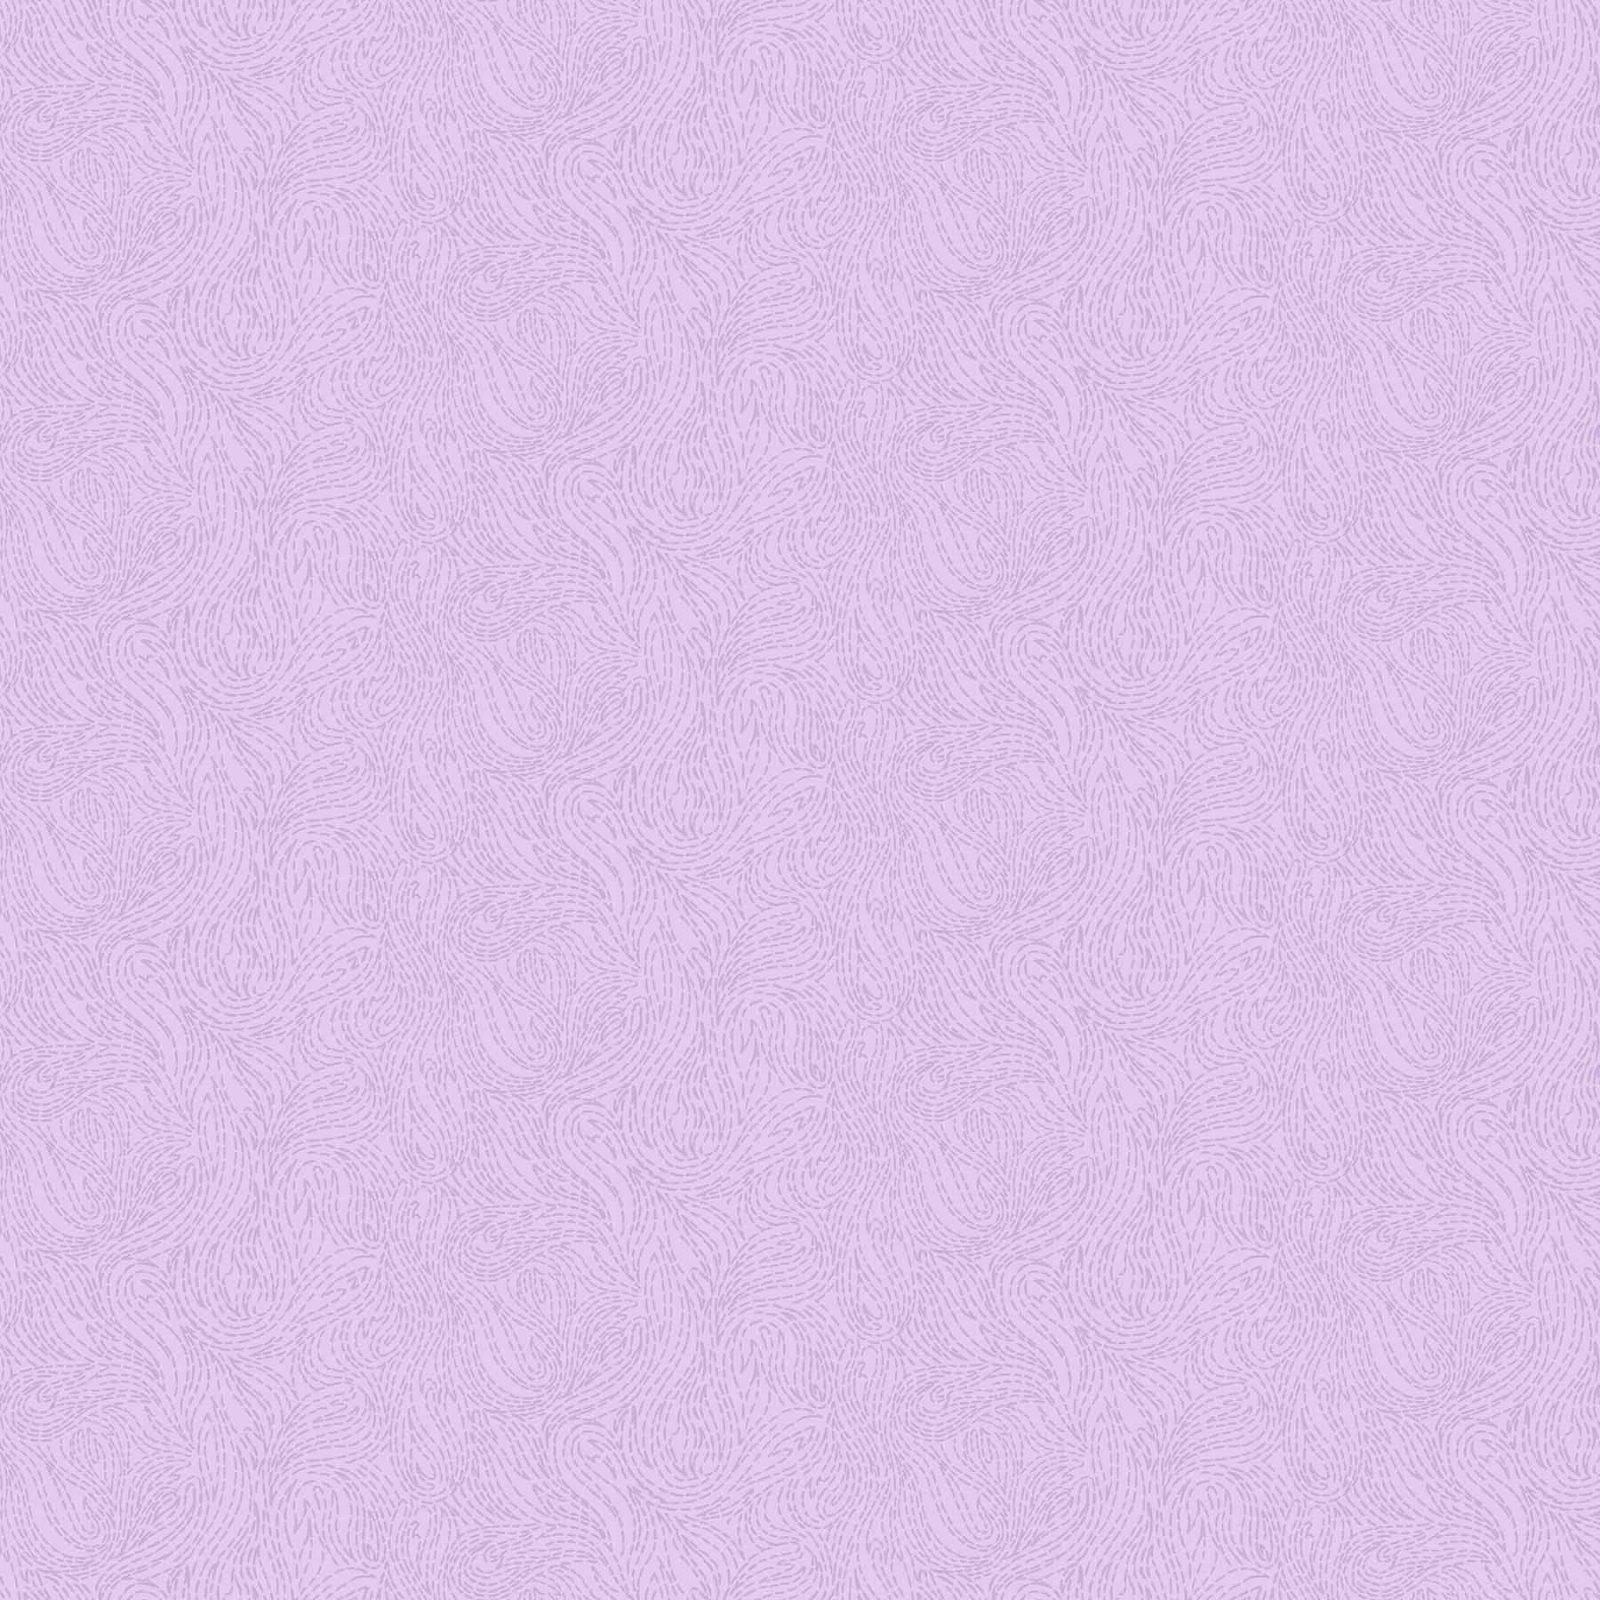 Lilac - Fire - FIGO Elements - 92009 80